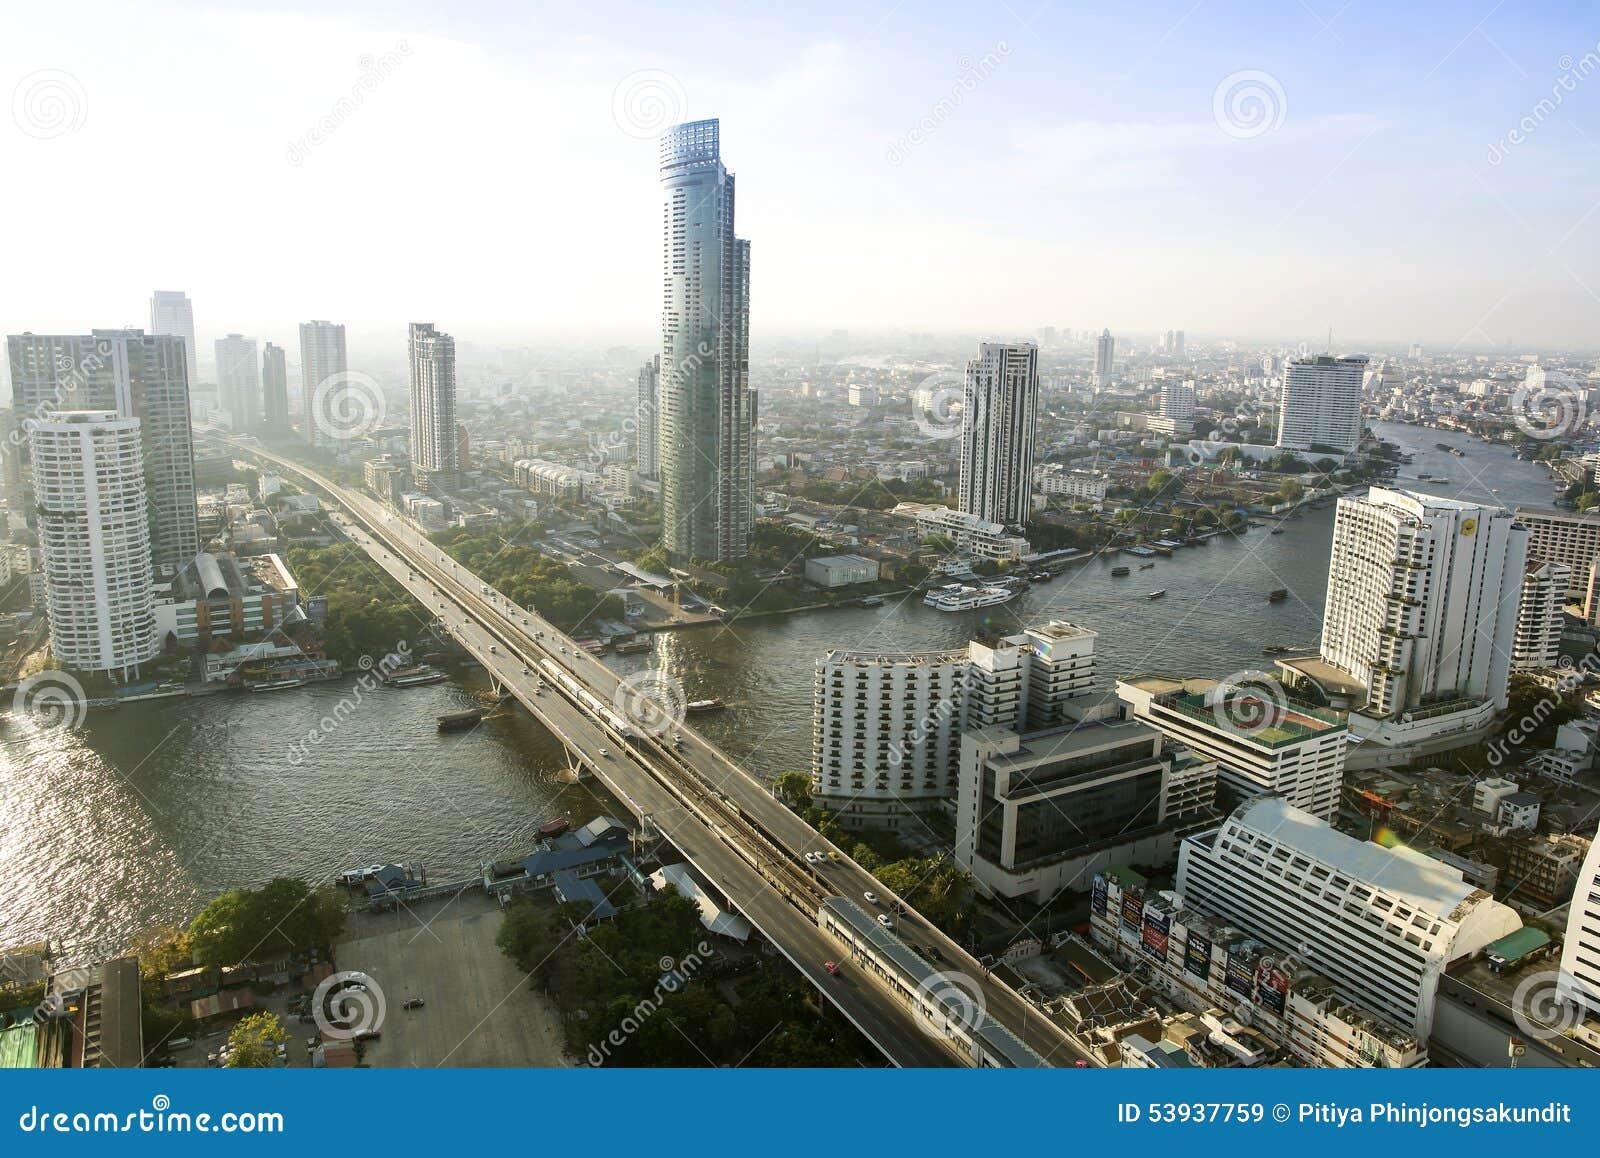 Bangkok ville 5 avril : Ville de vue supérieure le 5 avril 2015 à Bangkok